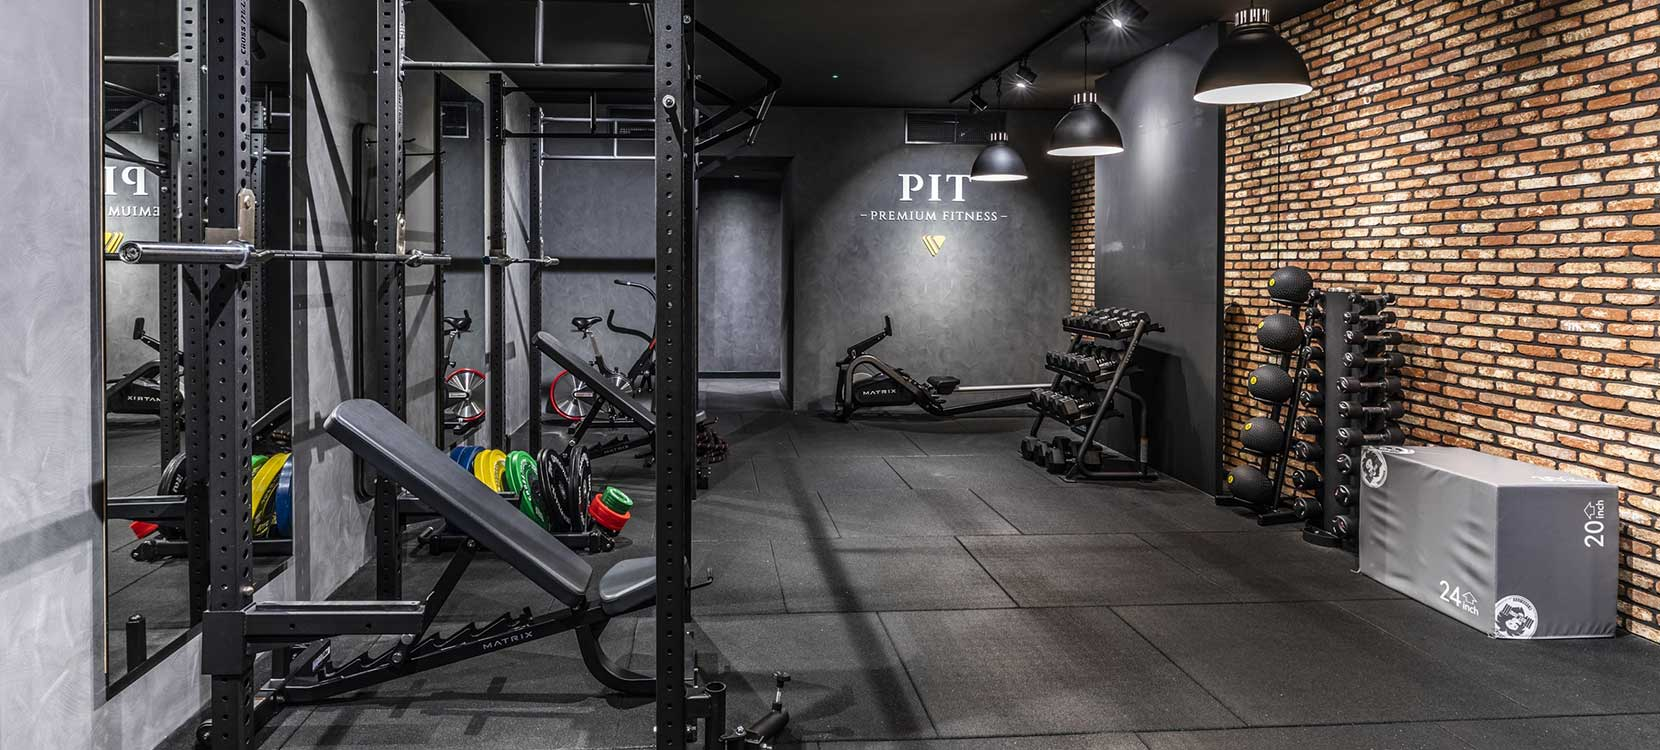 PIT Fitness